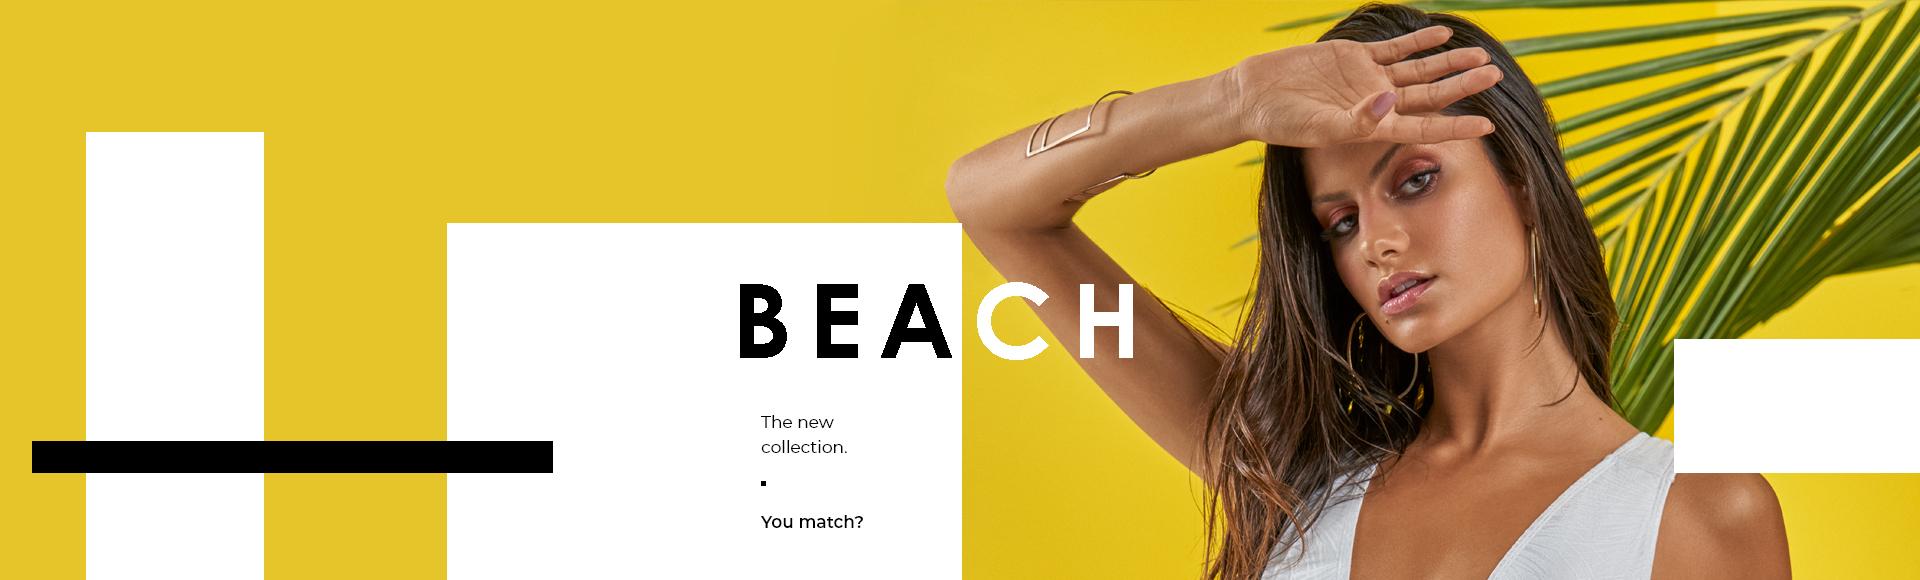 banner-beach